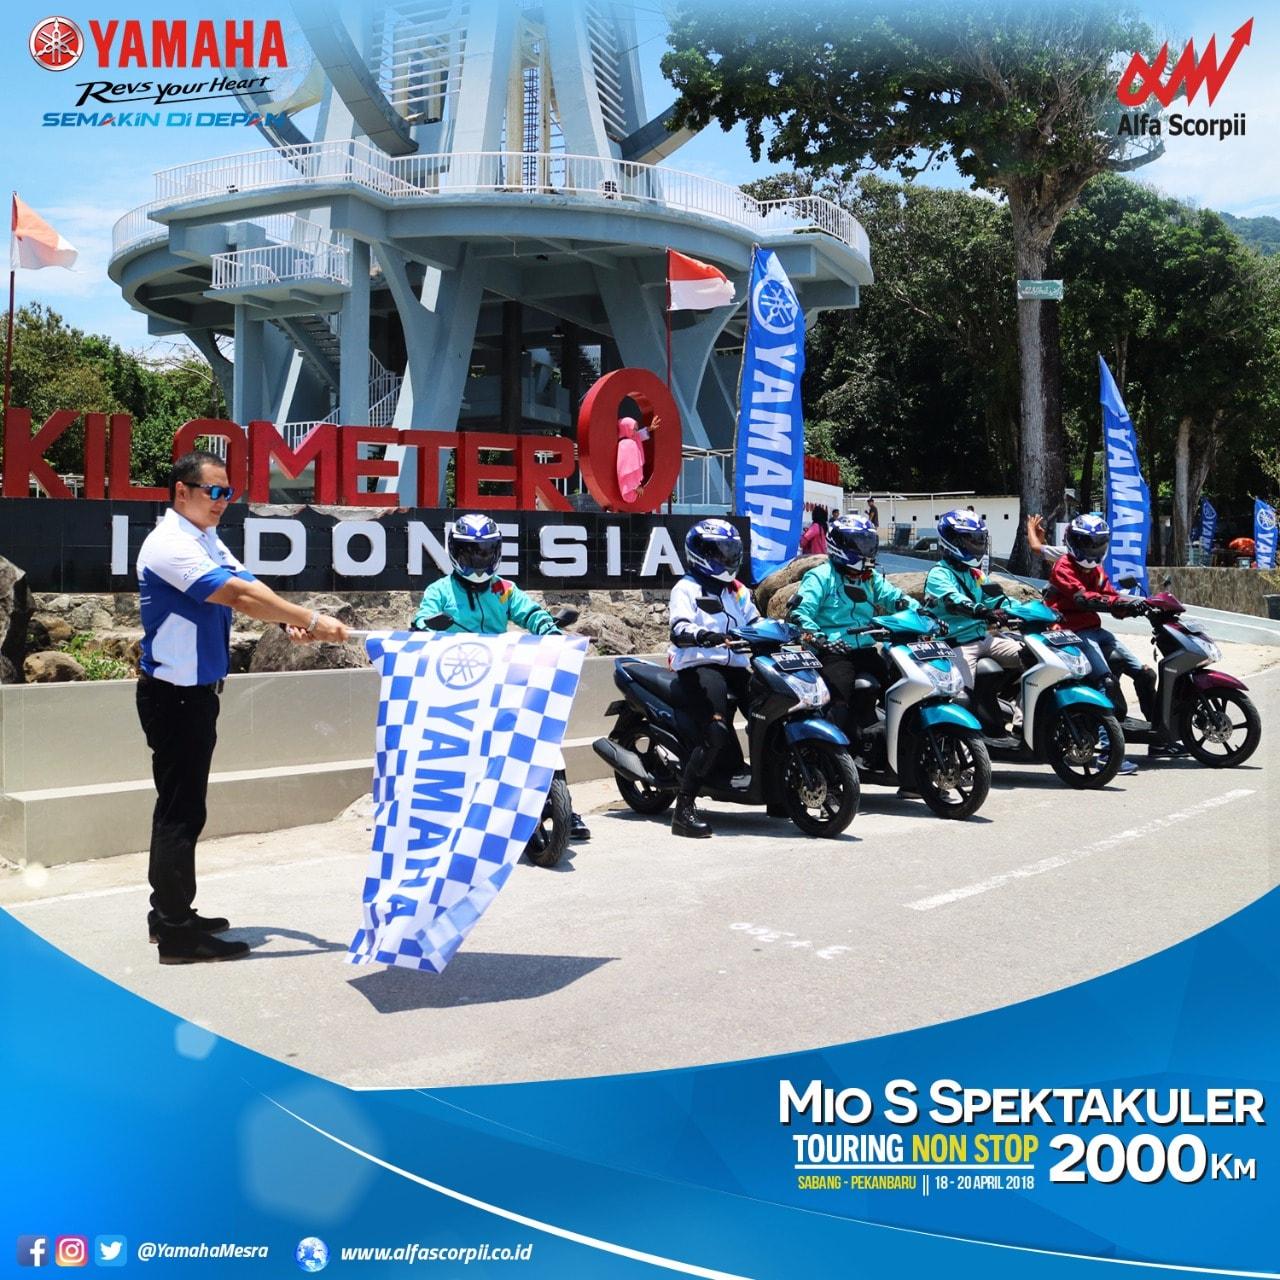 Alfa Scorpii pamerkan keunggulan Yamaha MIO S dengan touring 2000 KM dari Sabang sampai Pekanbaru nonstop !